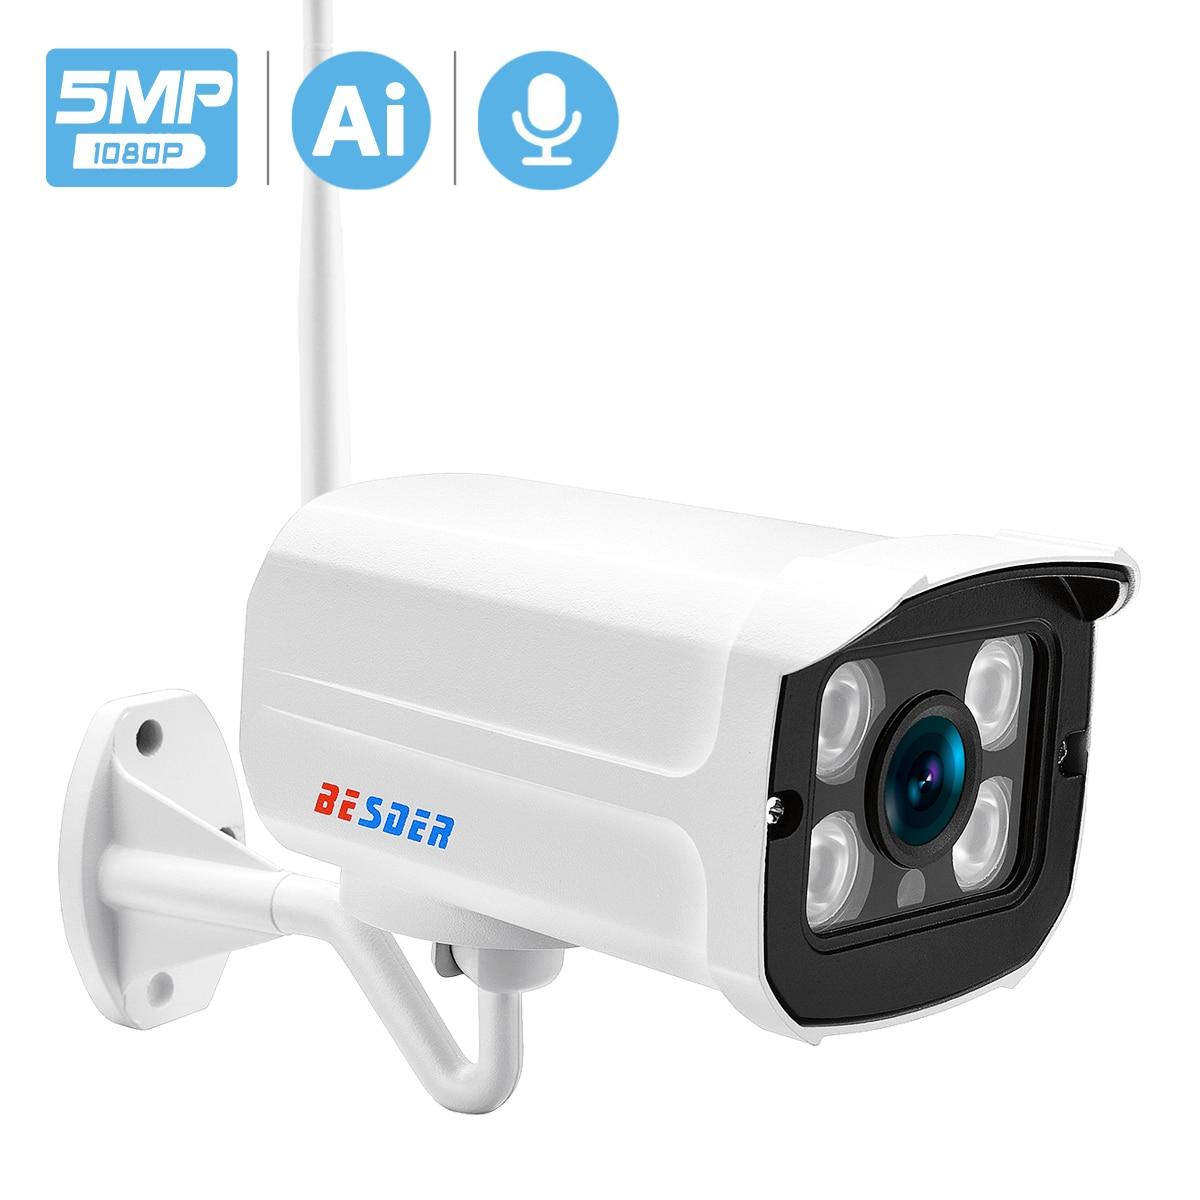 BESDER 5MP 3MP HD الصوت واي فاي كاميرا IP 1080P HD مراقبة الفيديو الأشعة تحت الحمراء للرؤية الليلية CCTV الأمن IP كاميرا TF بطاقة سحابة التخزين